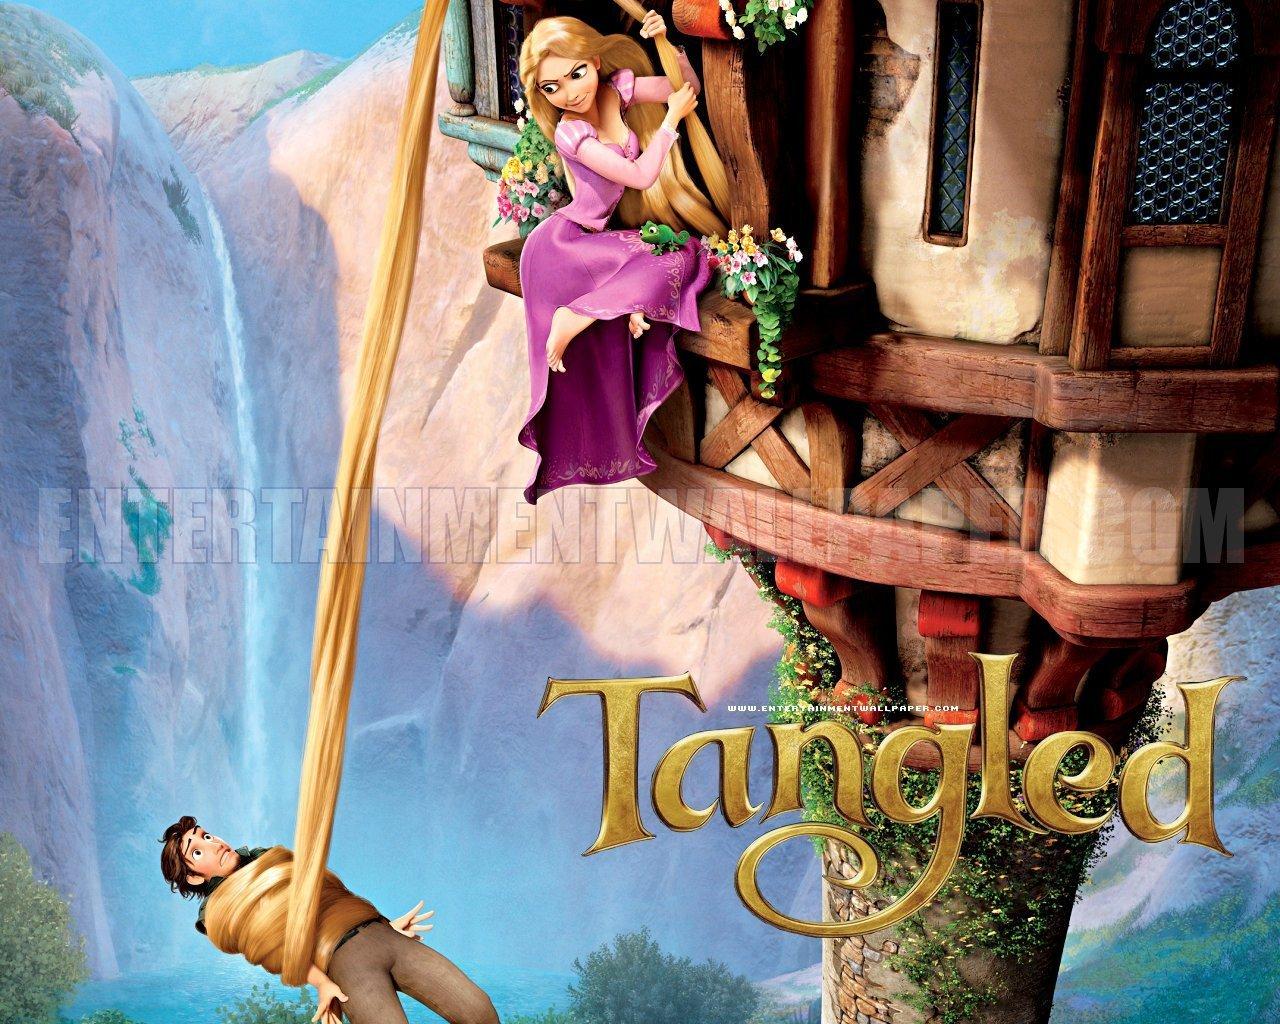 Tangled Rapunzel Flynn And Maximus HD Desktop Wallpaper 1280x1024